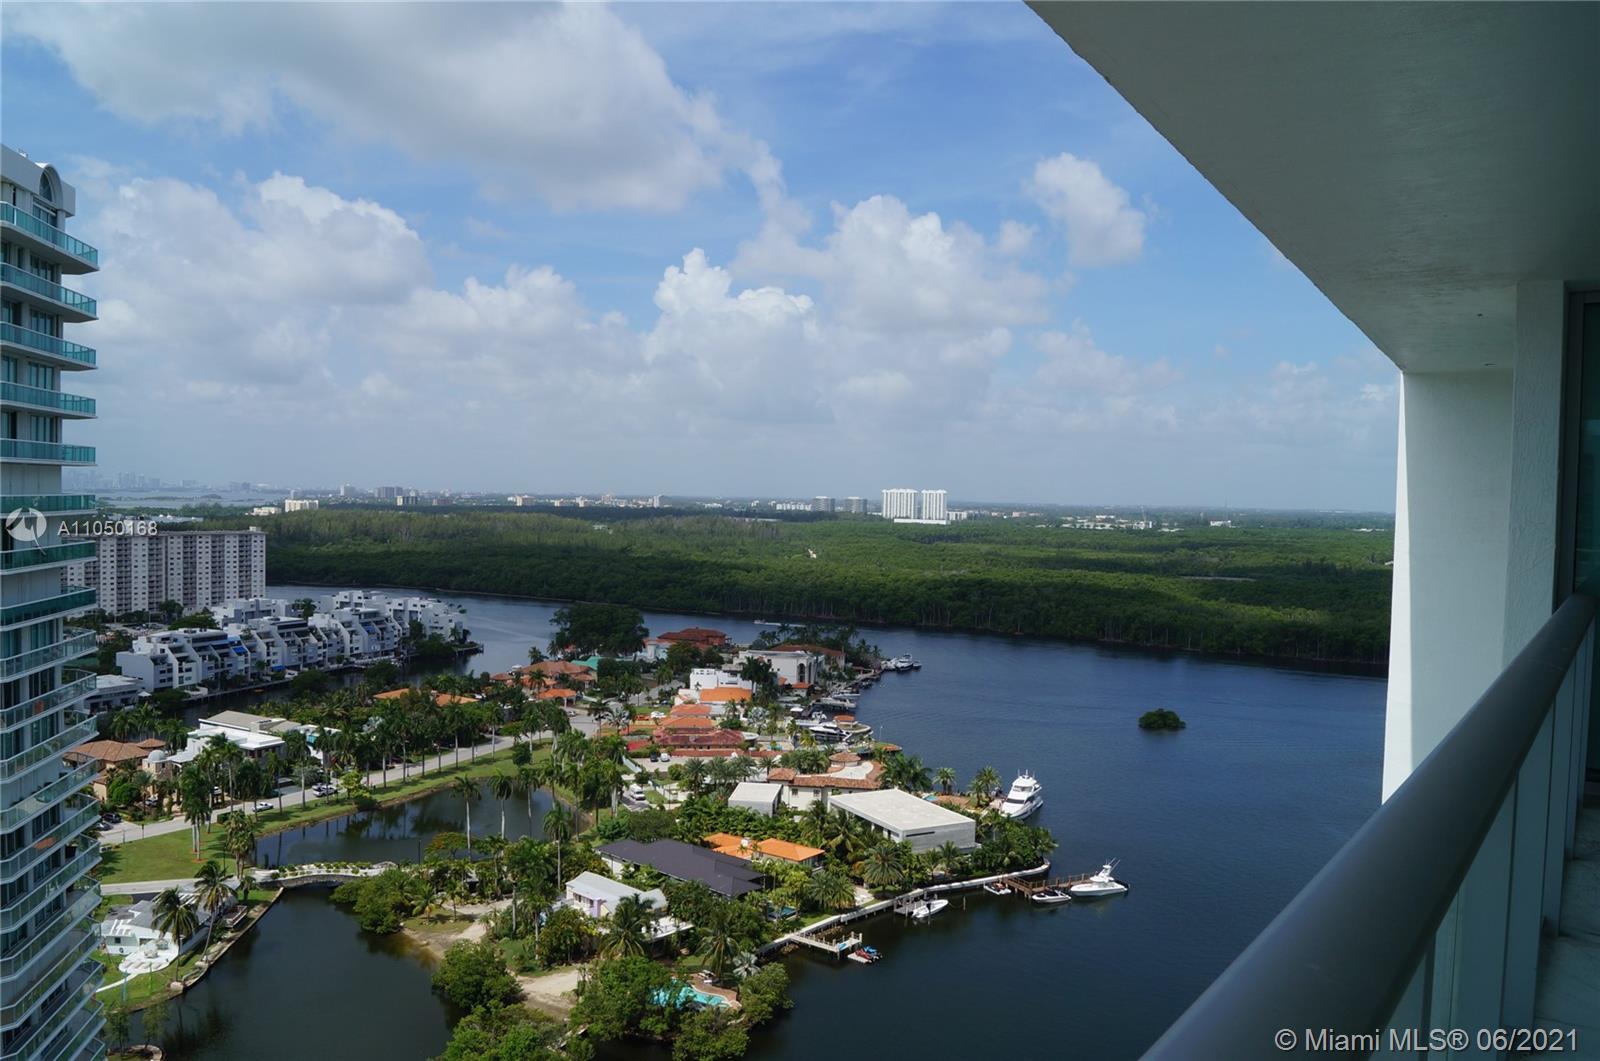 Parque Tower 1 #4-2404 - 300 Sunny Isles Blvd #4-2404, Sunny Isles Beach, FL 33160